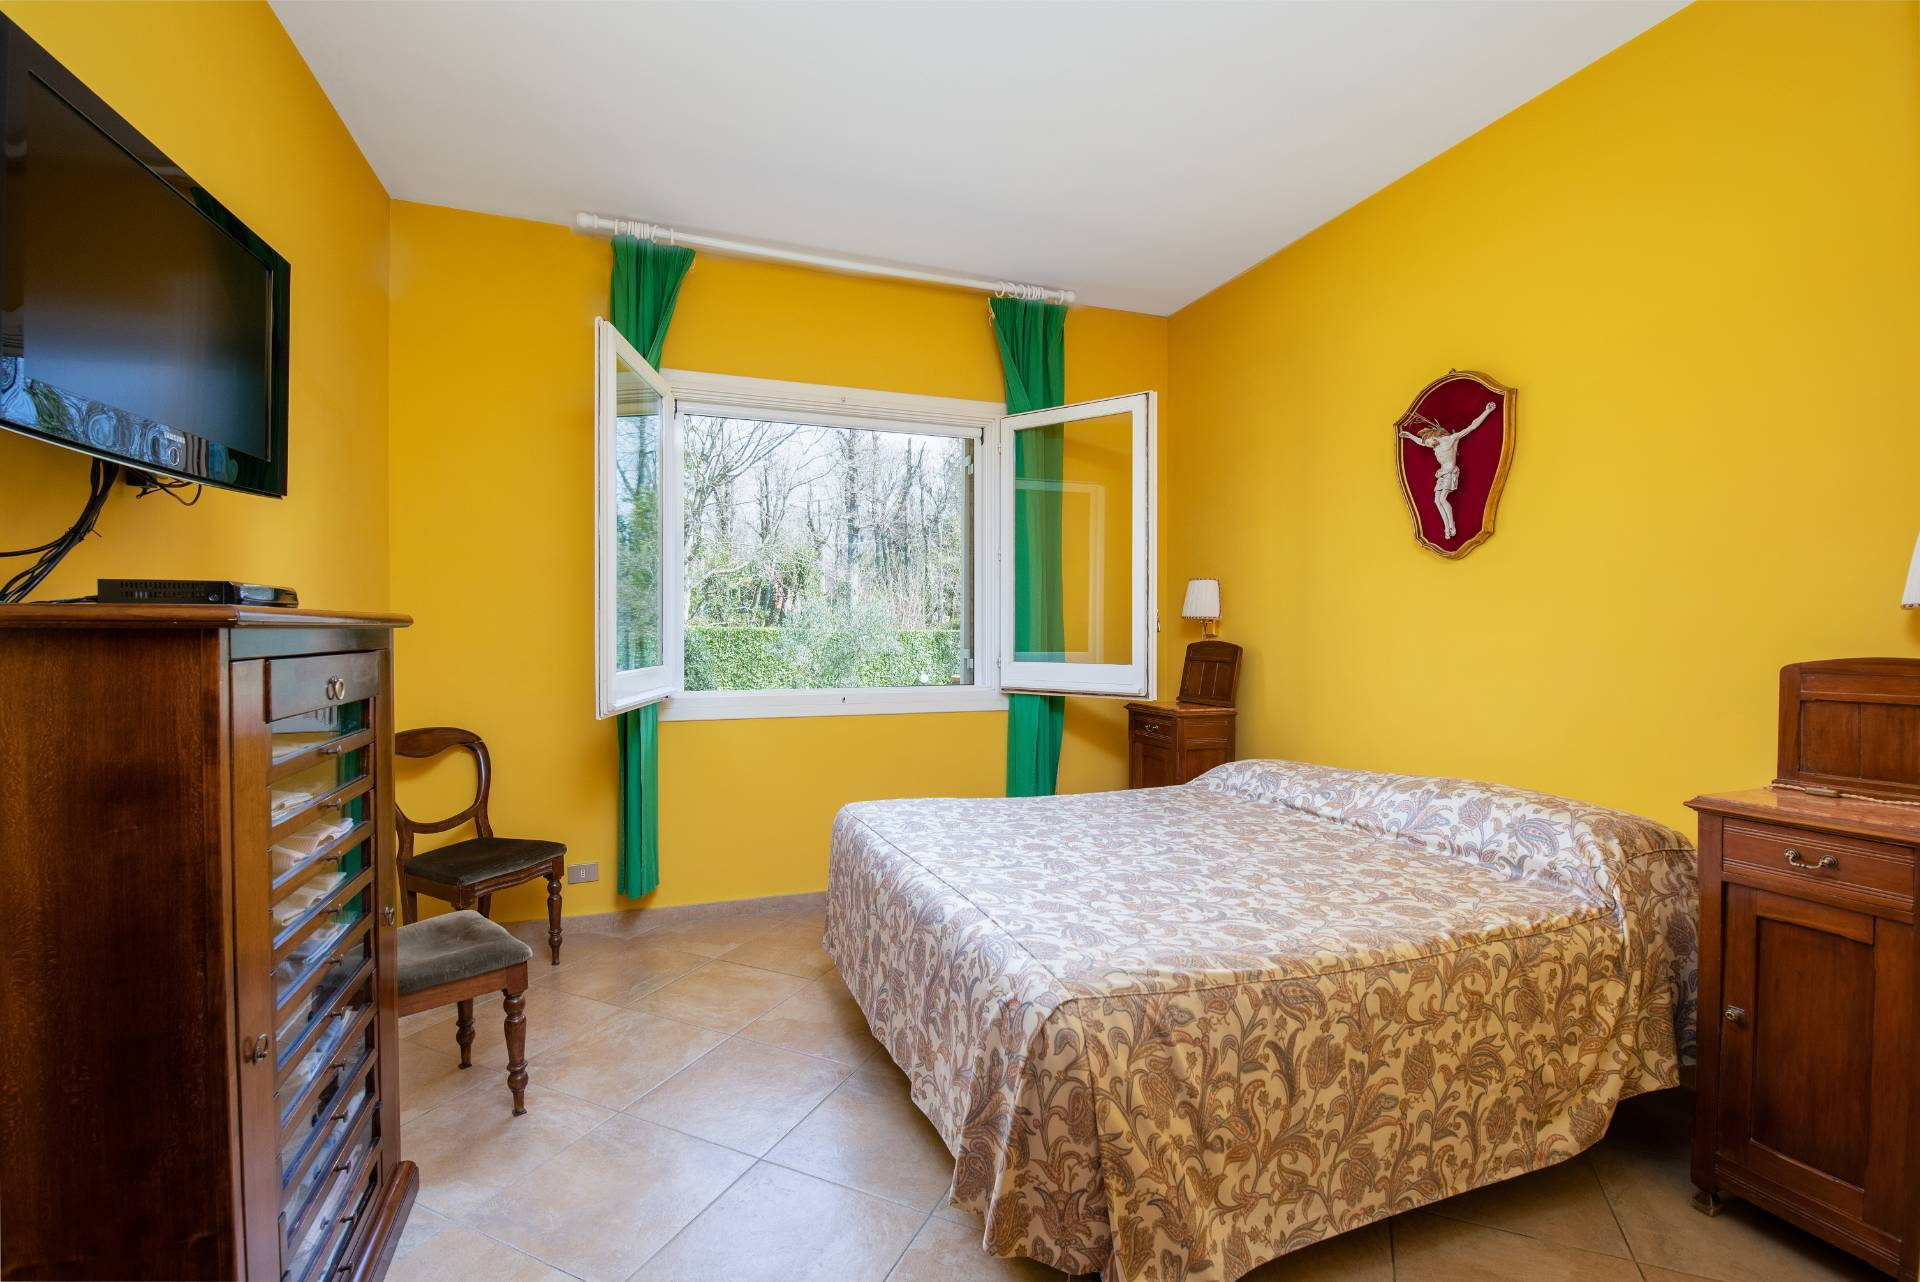 Villa in Vendita a Ariccia: 5 locali, 583 mq - Foto 10